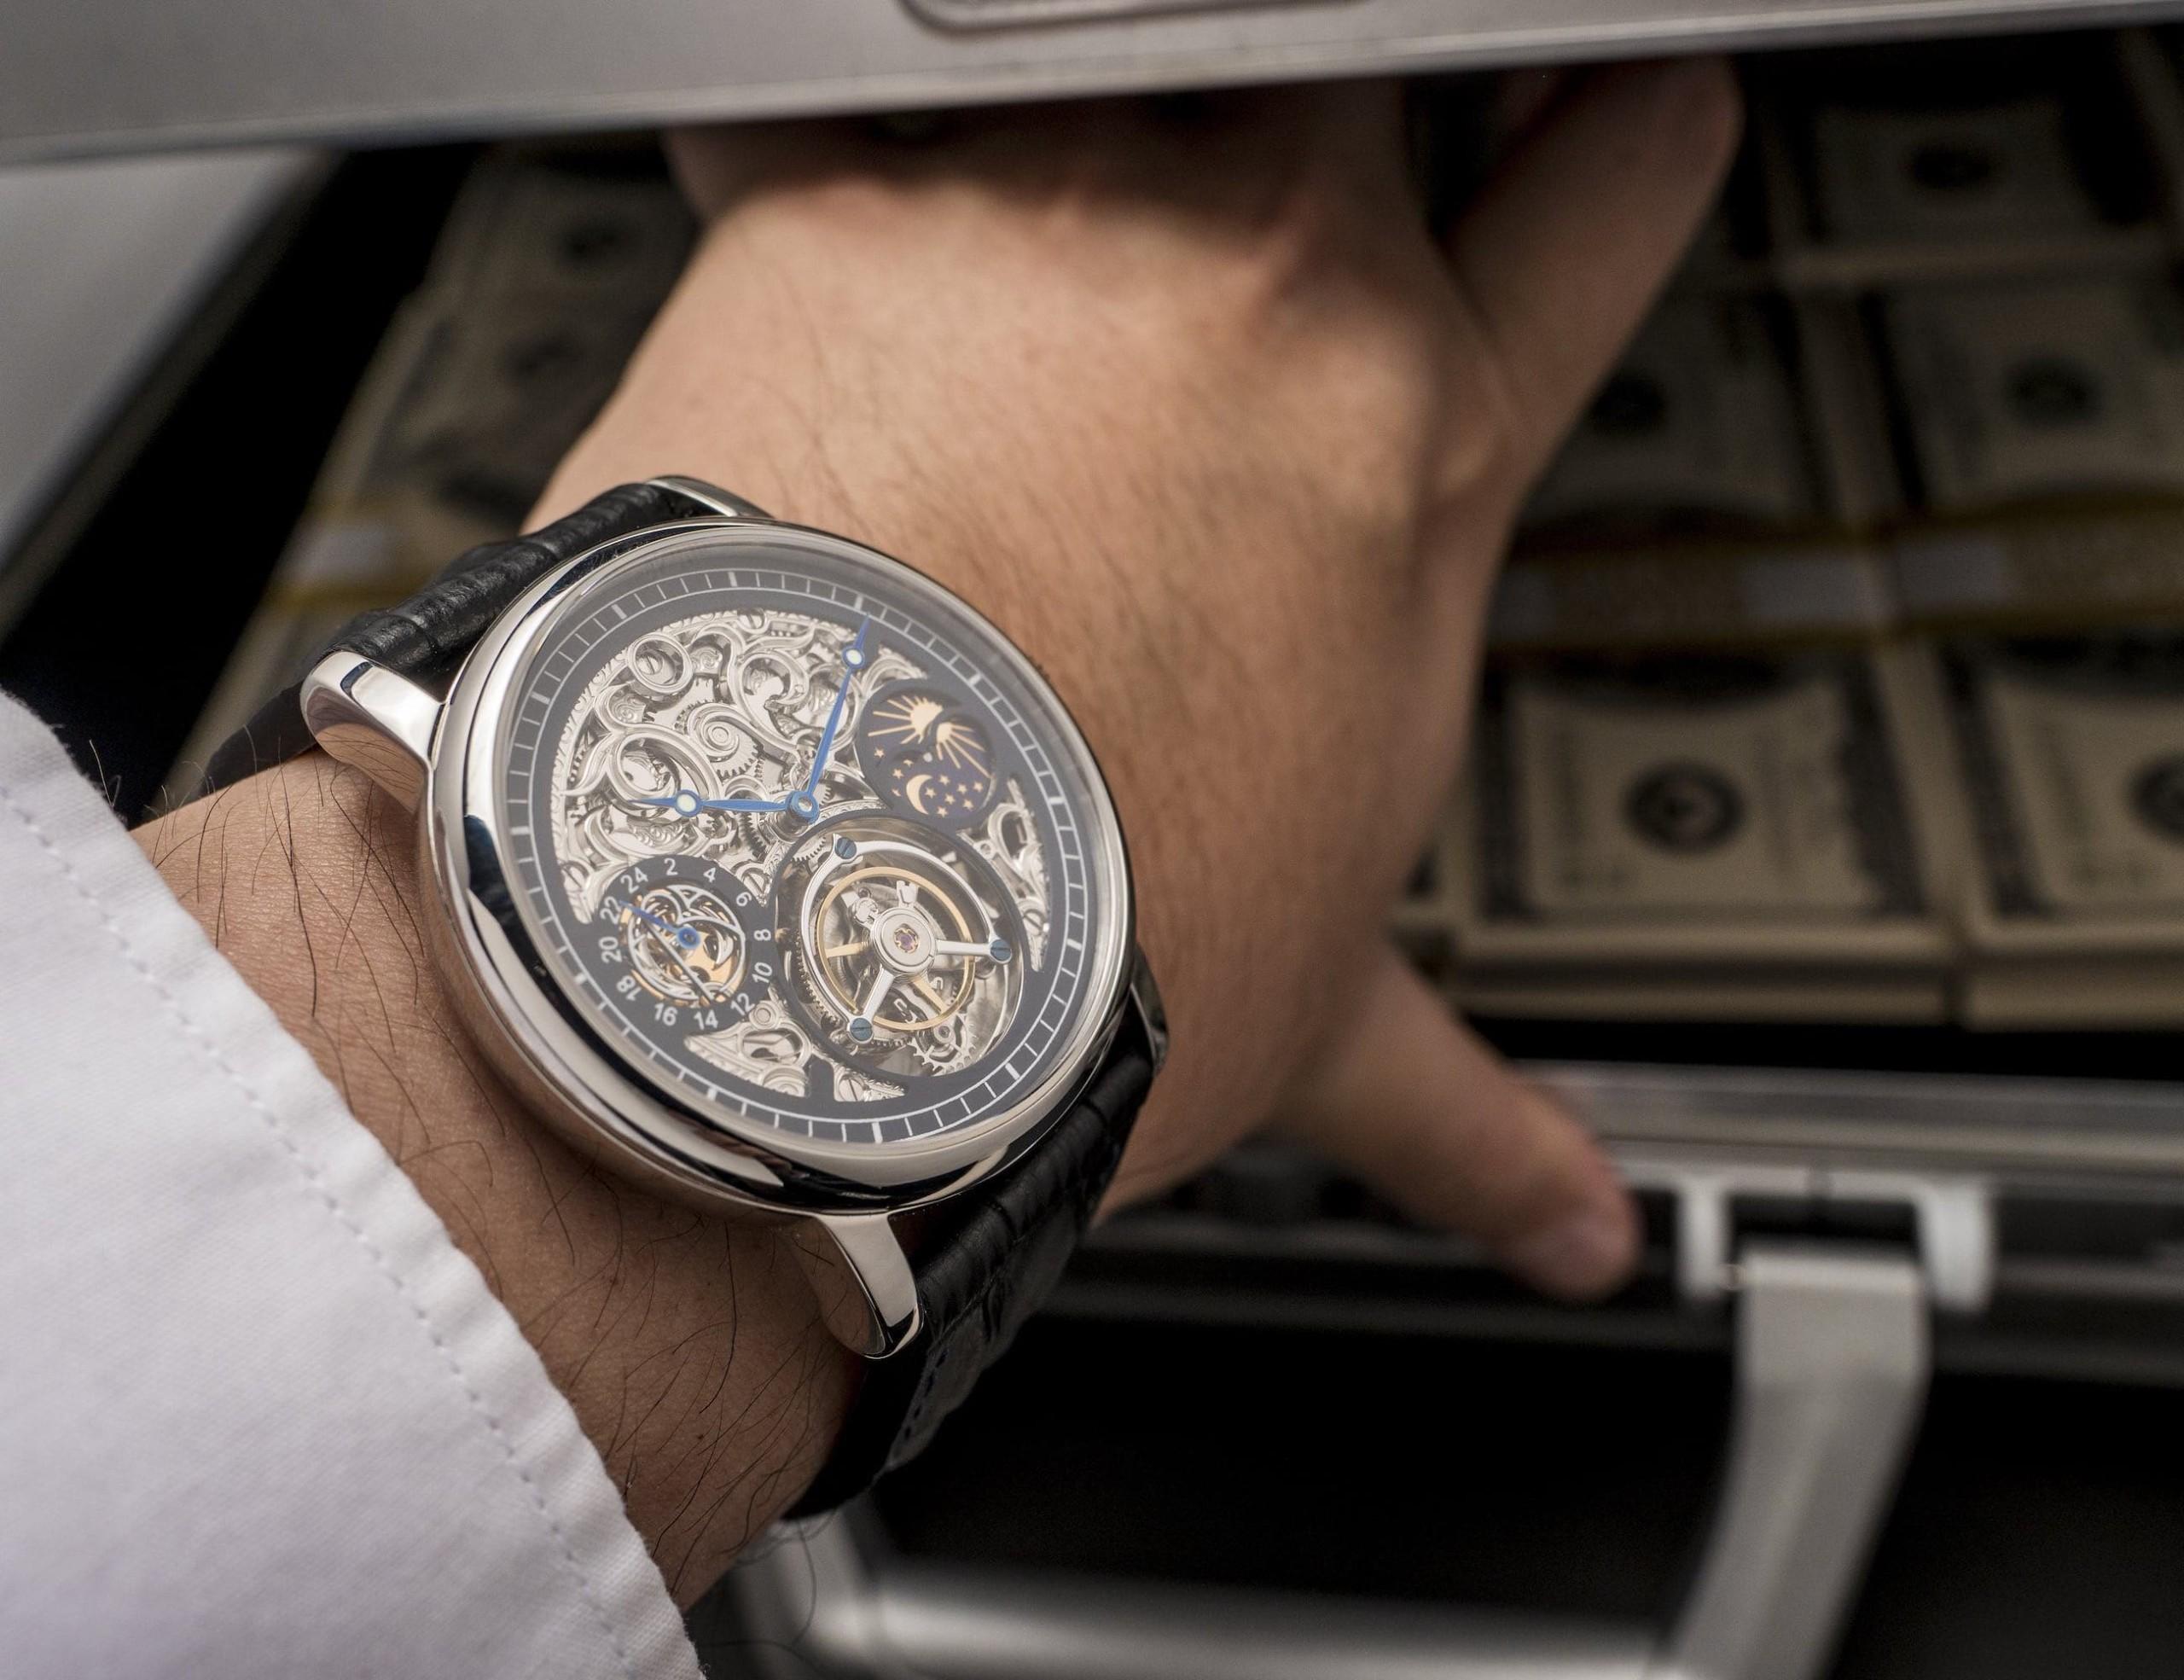 ERA Prometheus Certified Millionaire Tourbillon Watches